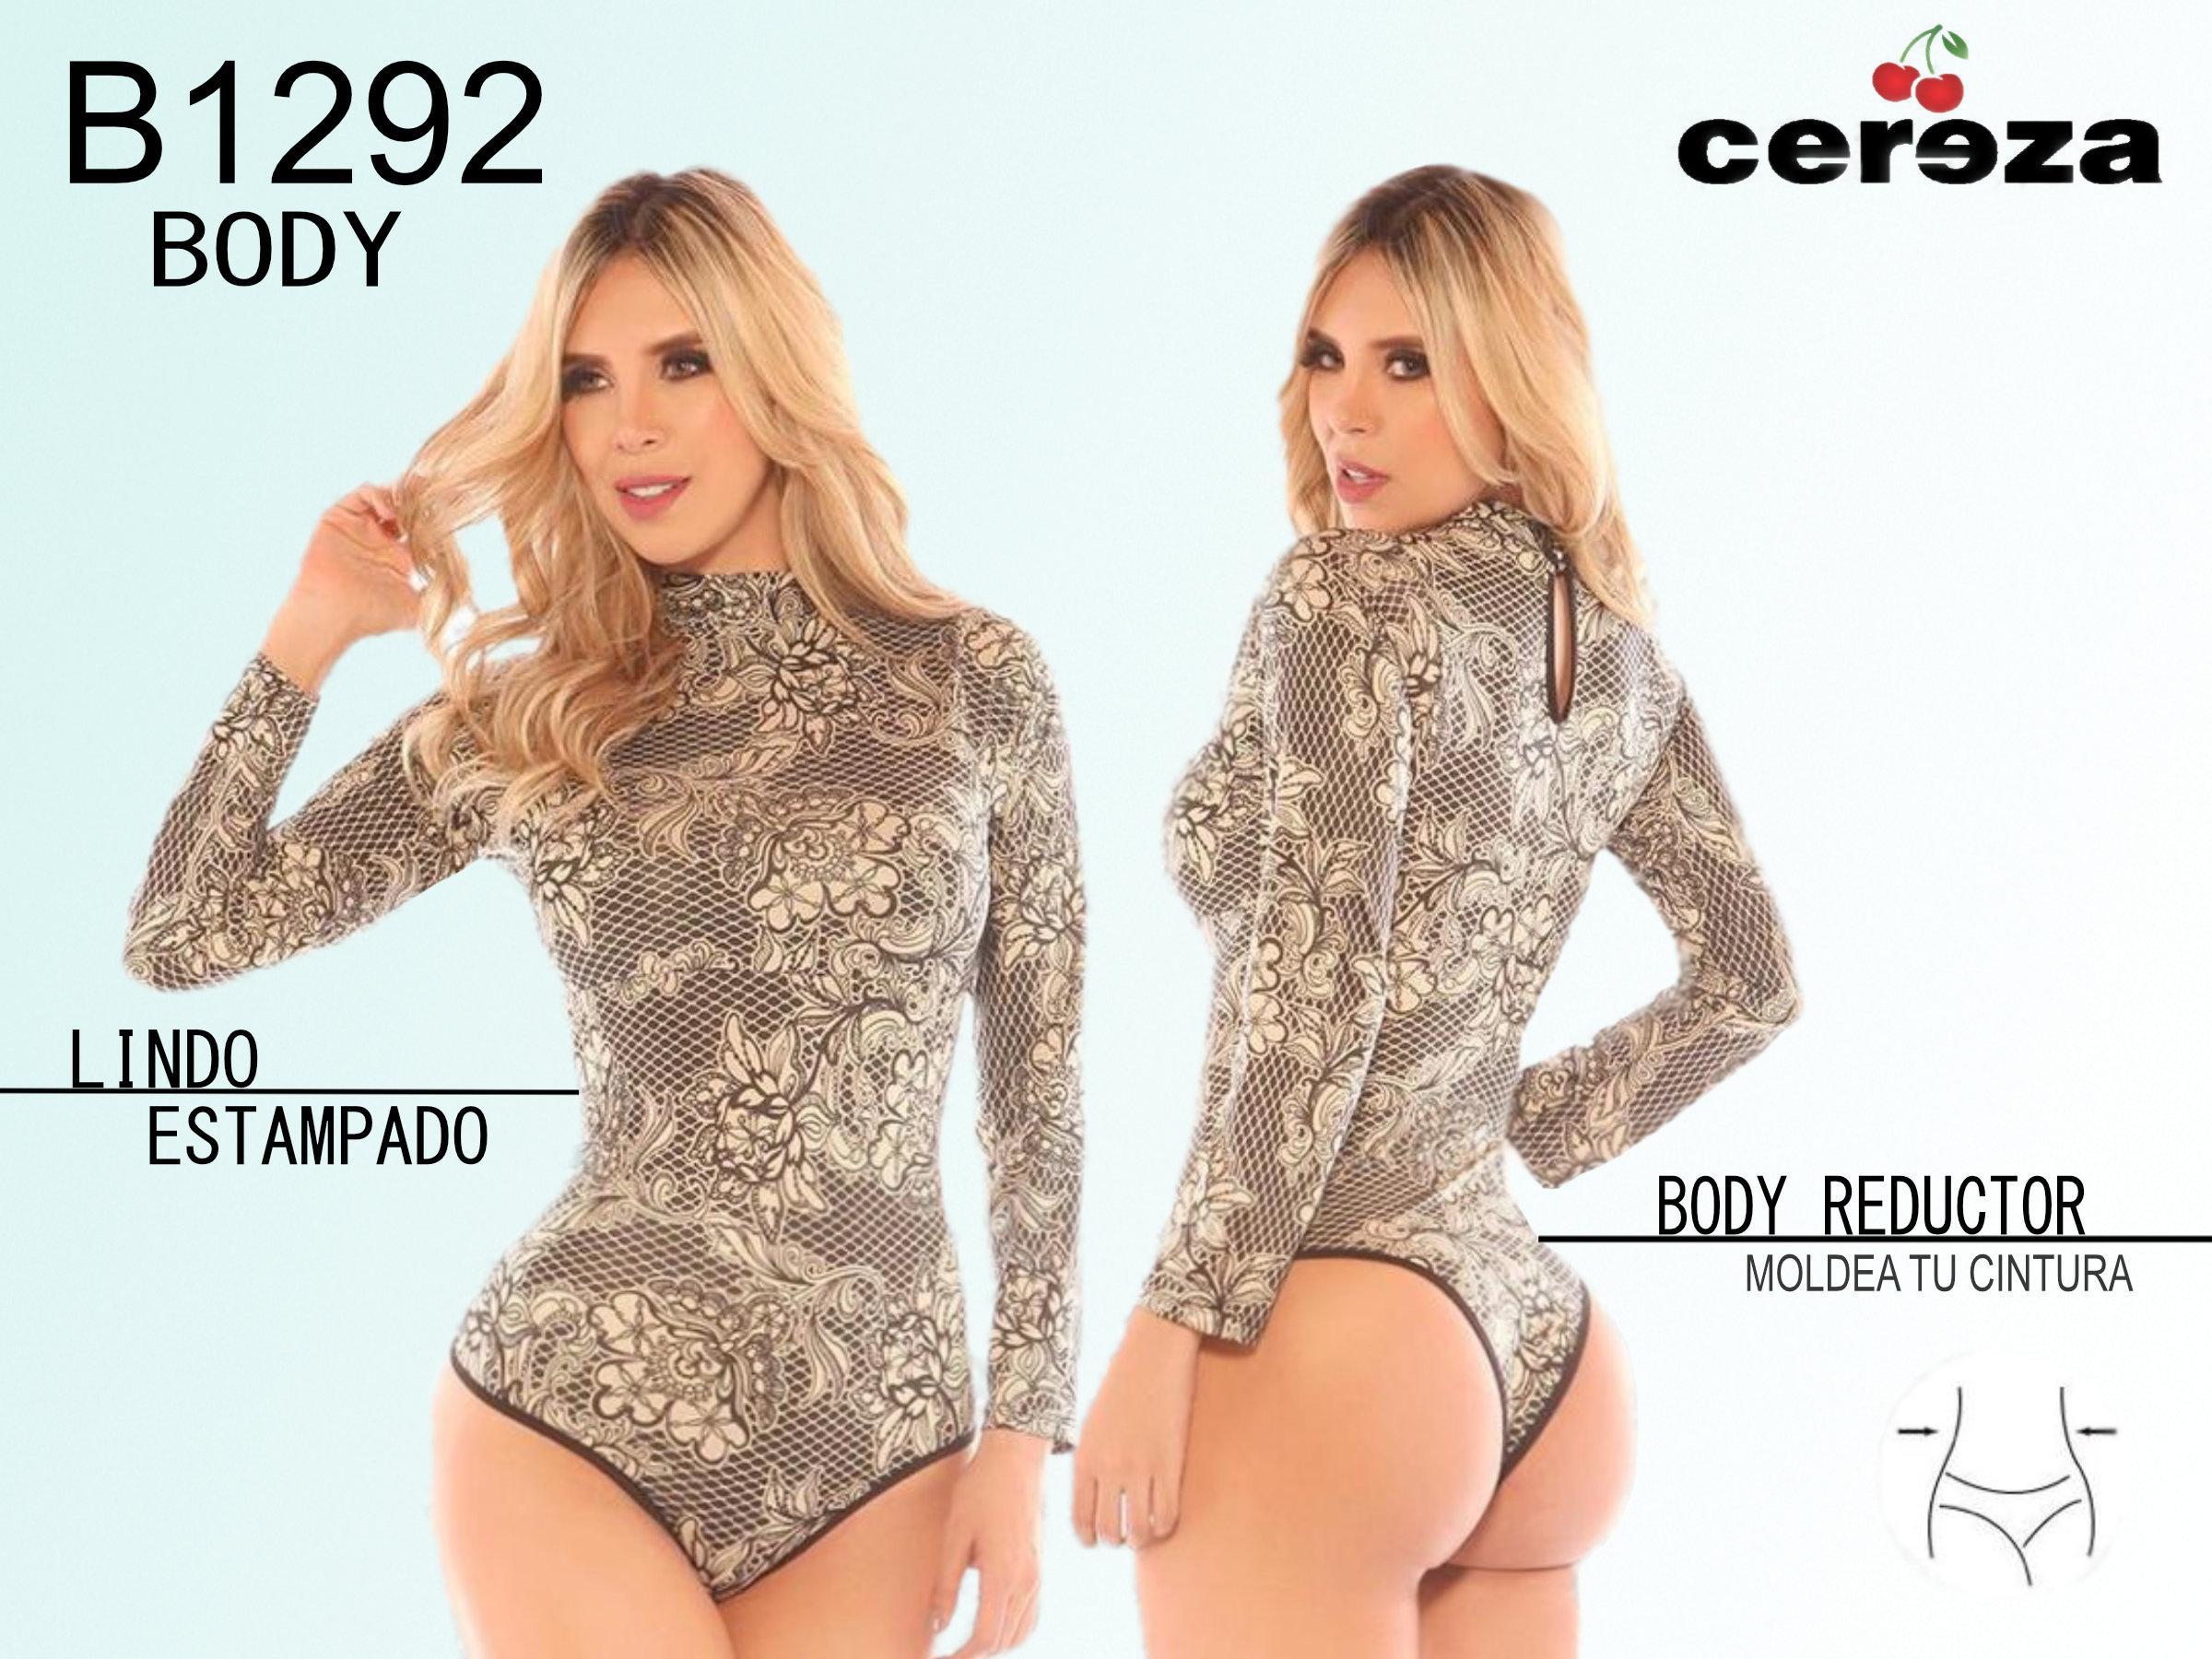 Body Reductor hecho en colombia